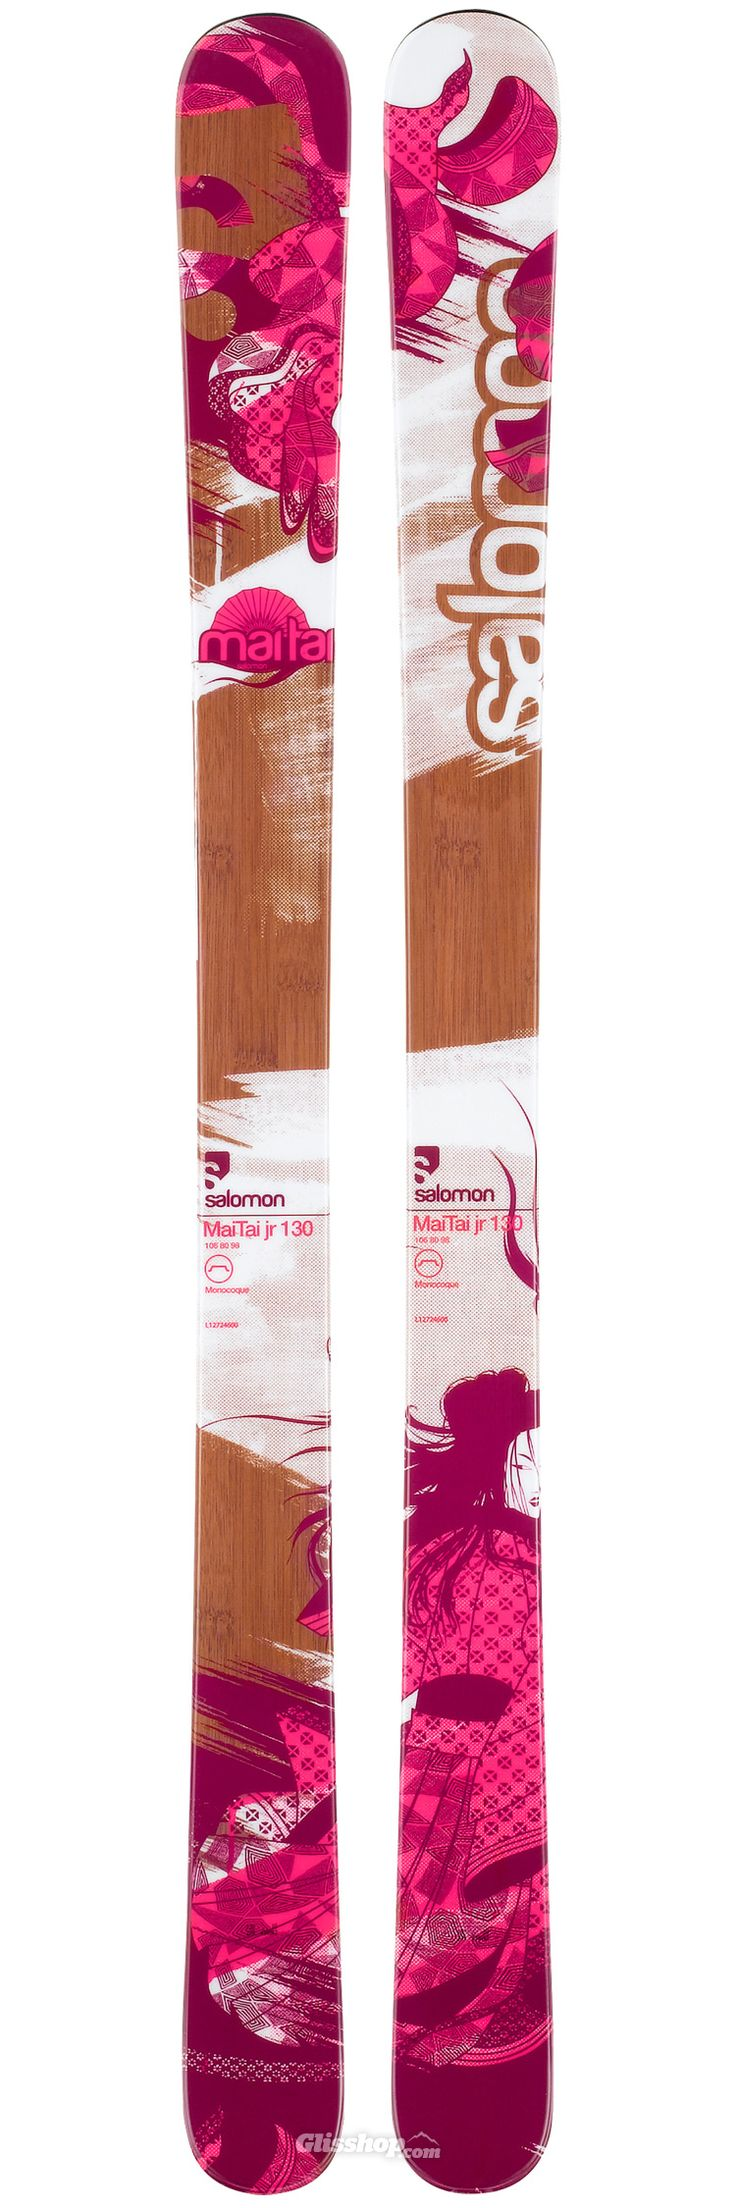 #Salomon, #Rossignol, #Dynastar... Quelle paire de skis alpins allez-vous choisir ?